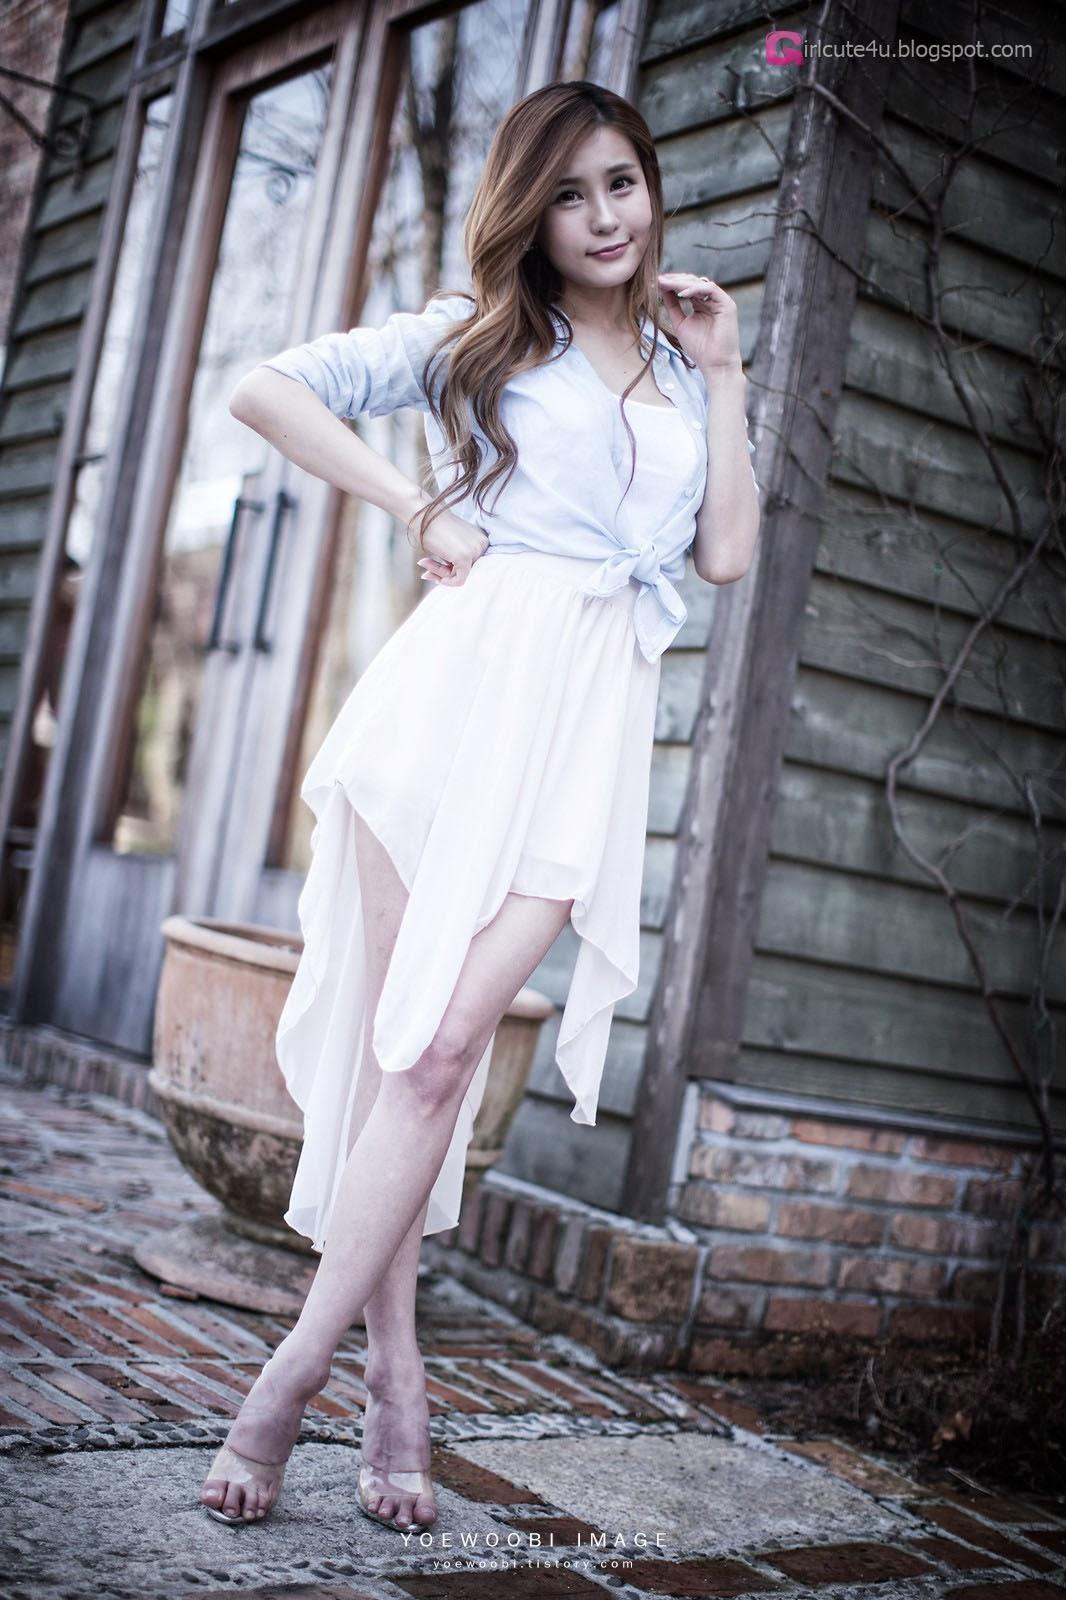 3 Lovely Soo Yu - very cute asian girl-girlcute4u.blogspot.com